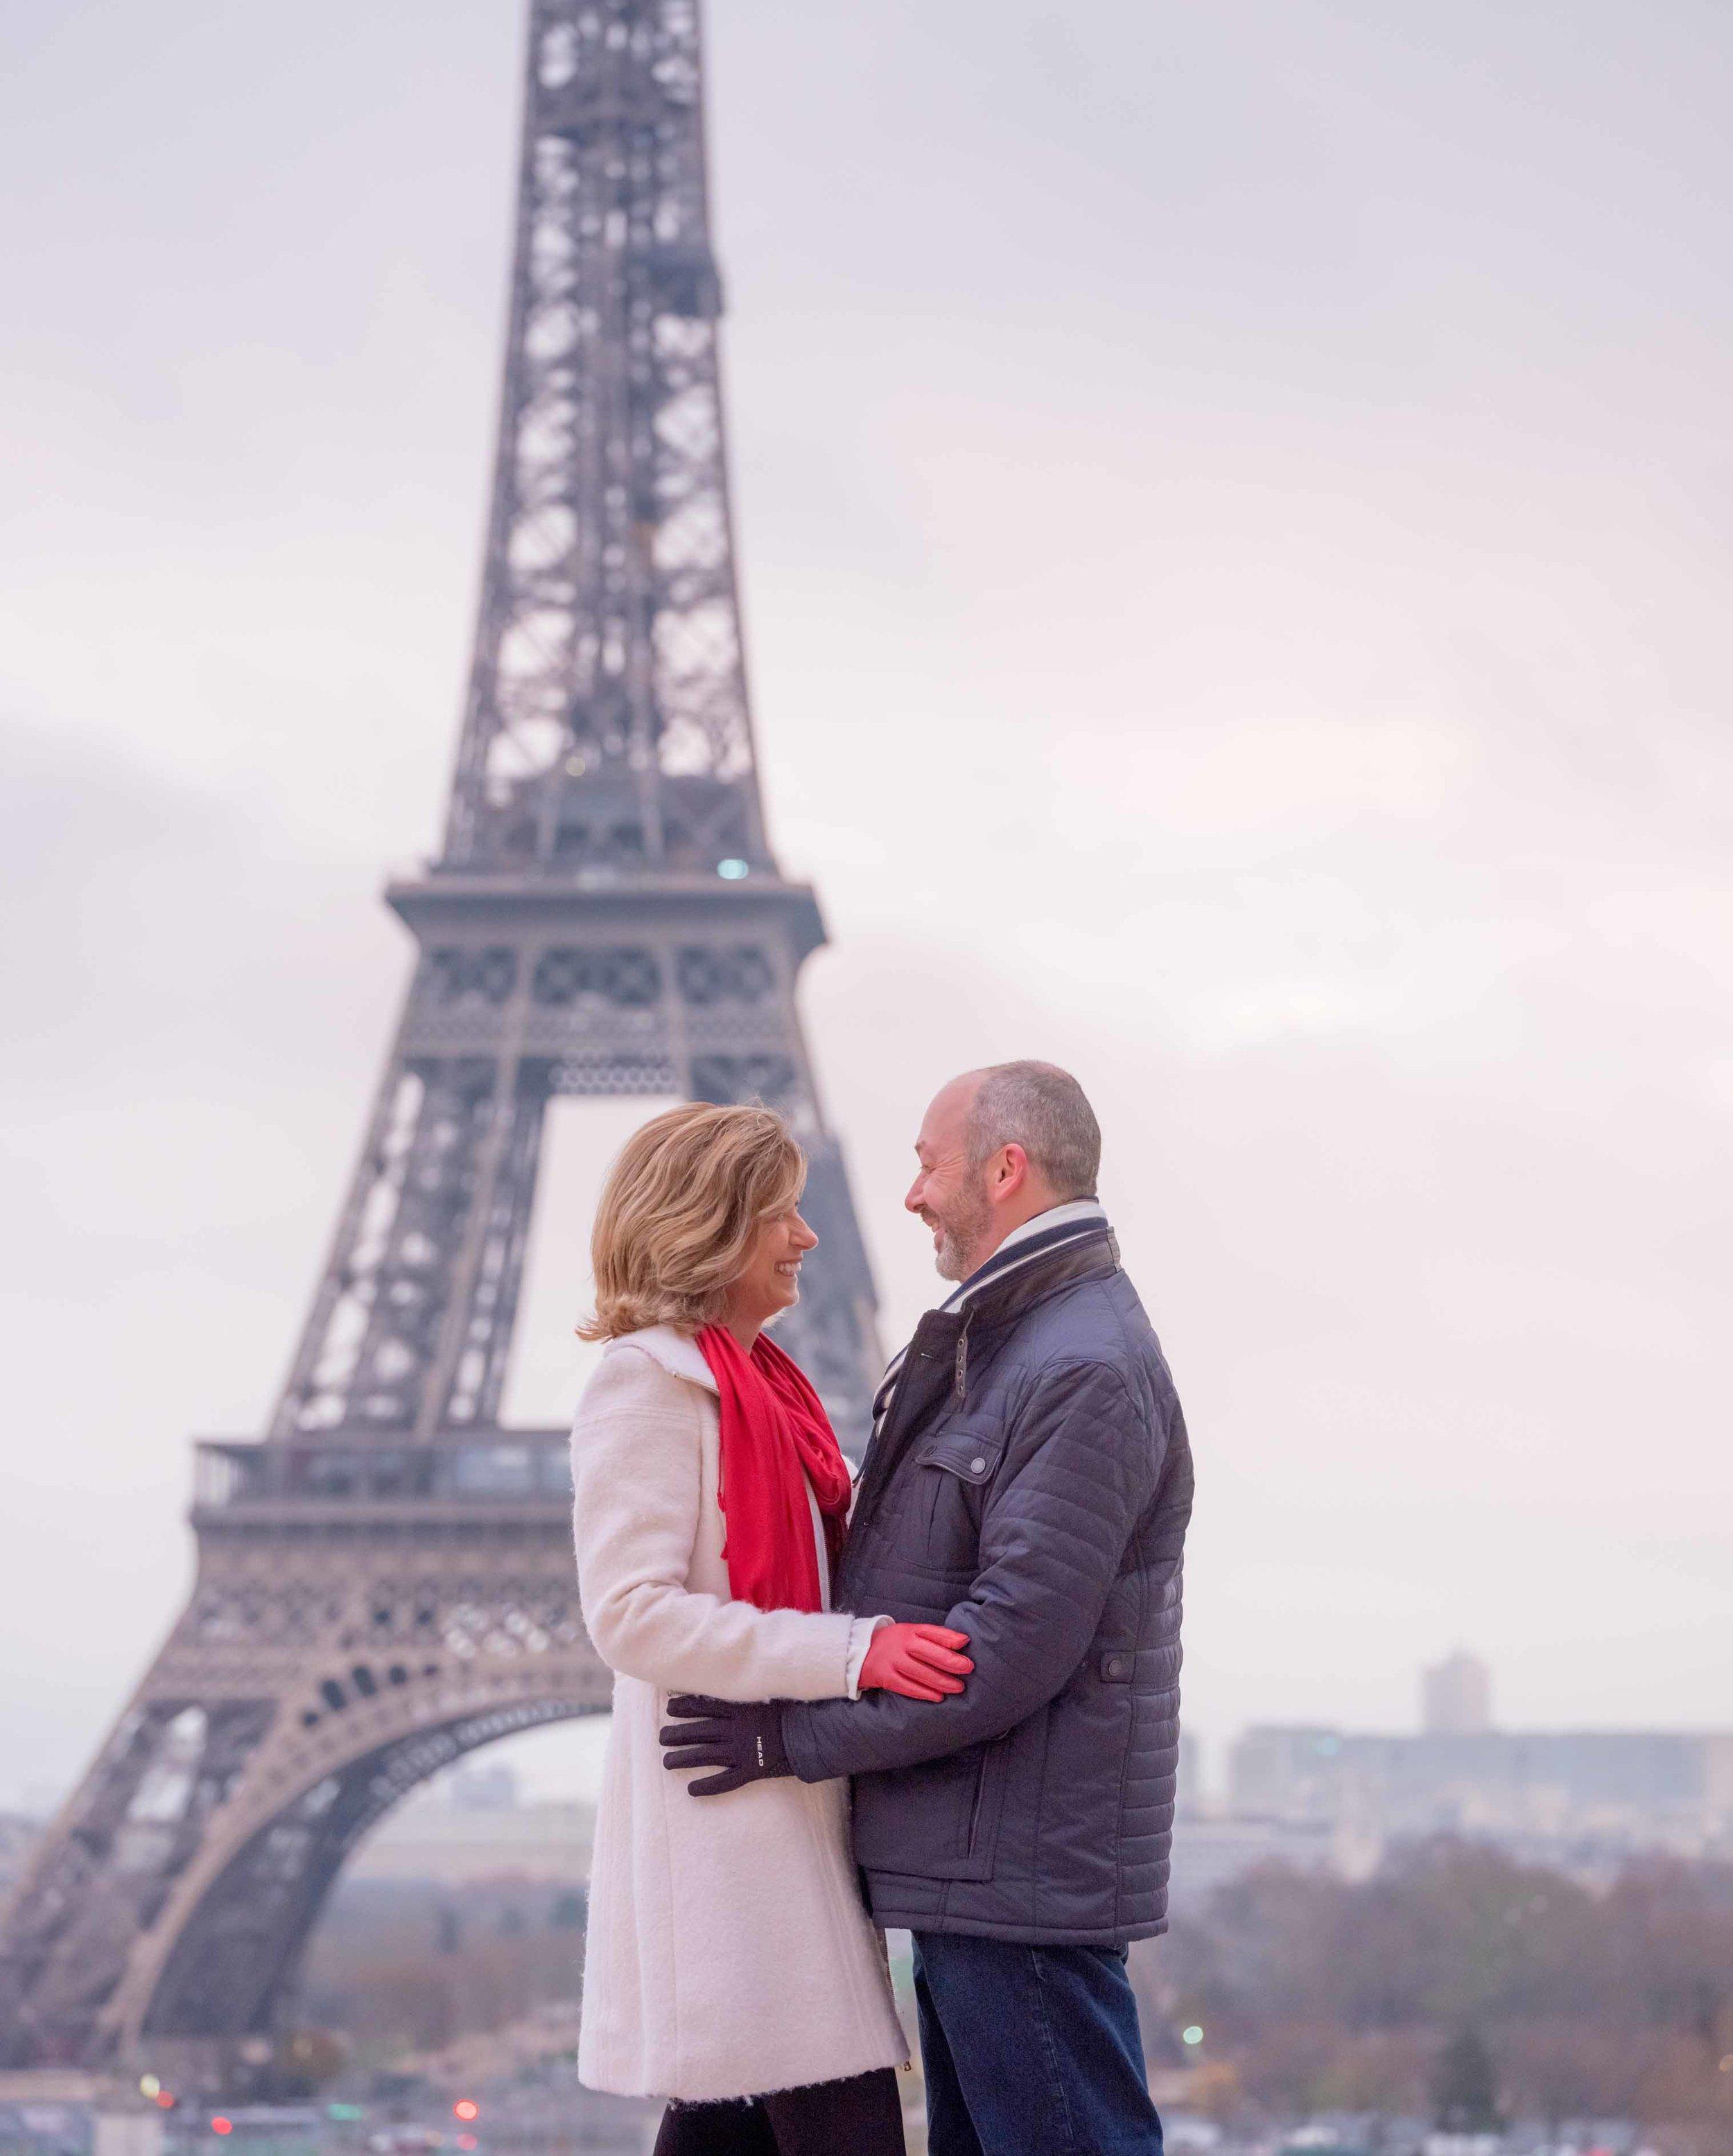 Paris Eiffel Tower love story